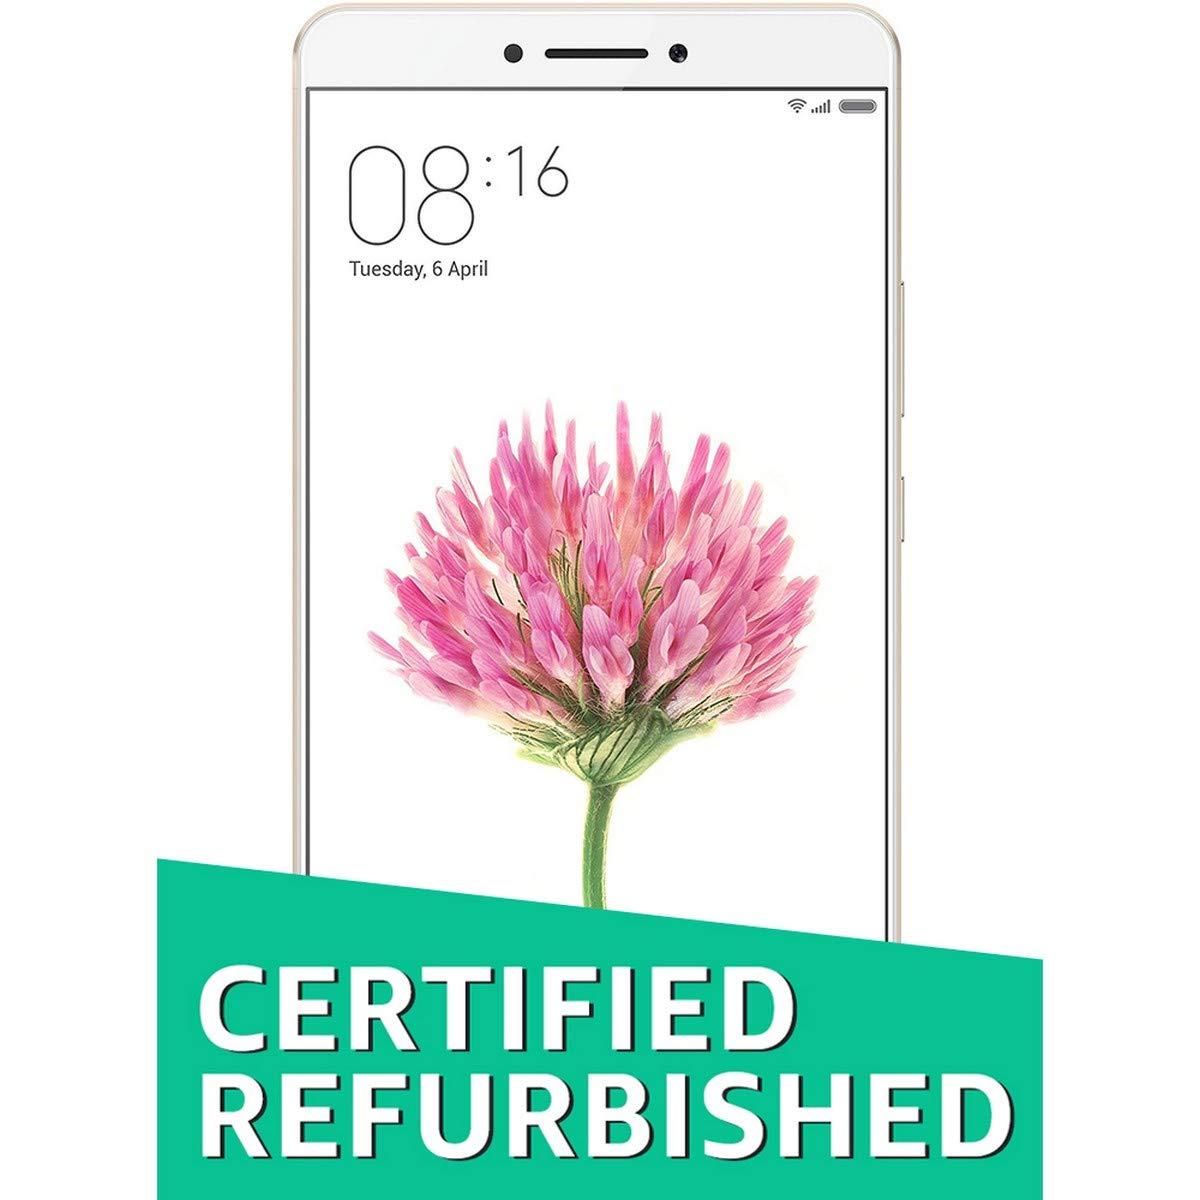 (Certified REFURBISHED) Mi Max (Gold, 32GB)